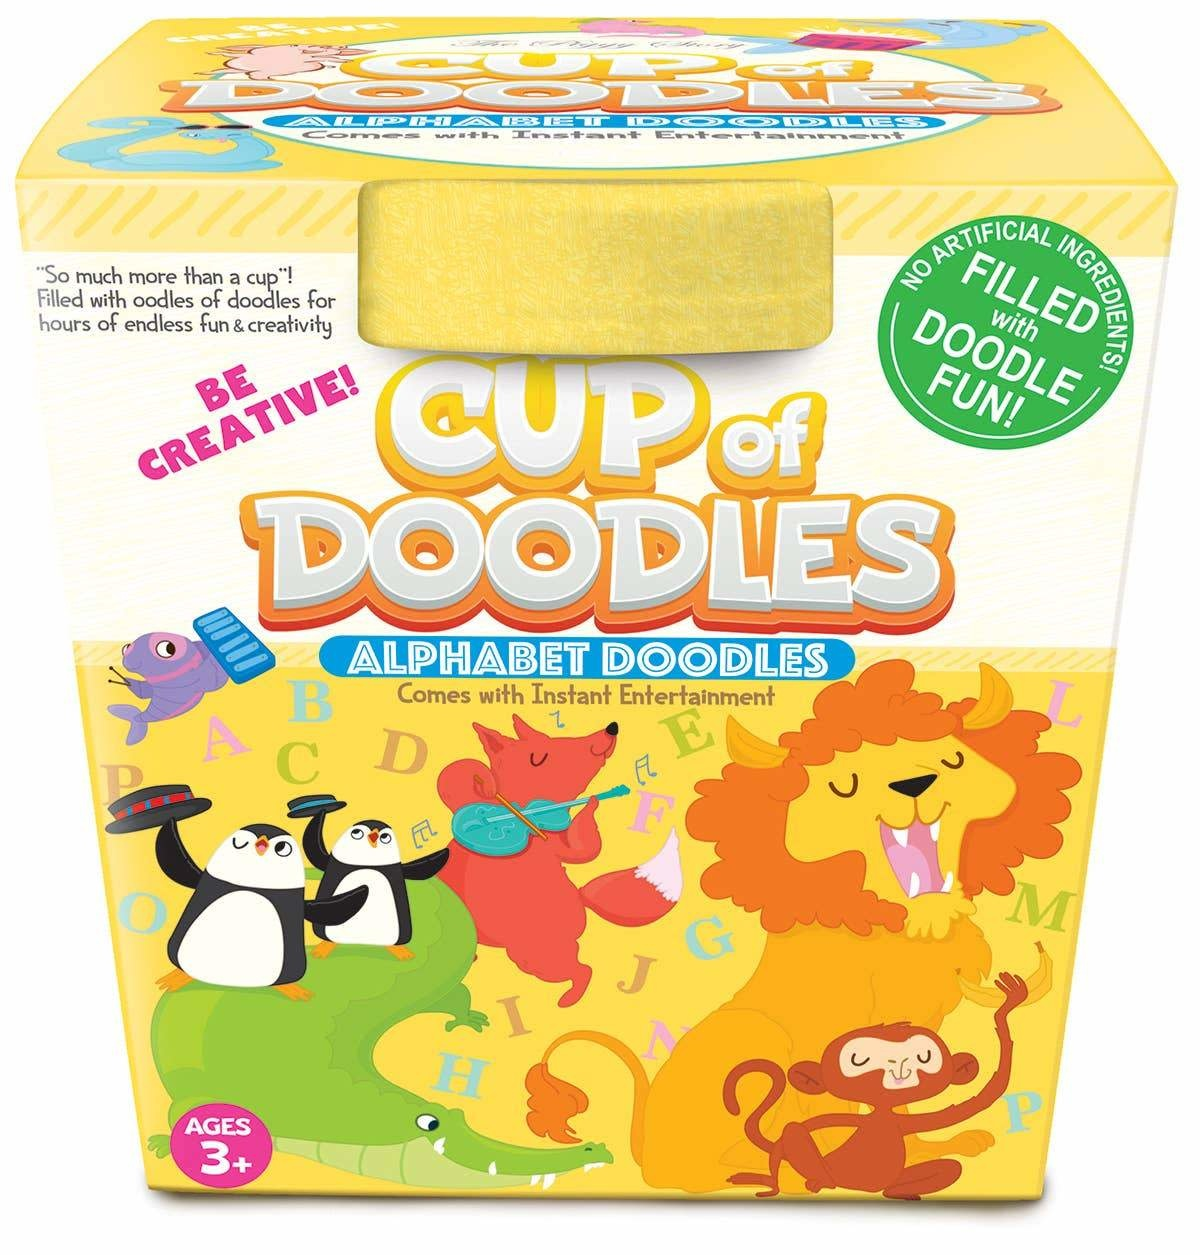 Cup of Doodles- Alphabet Doodles